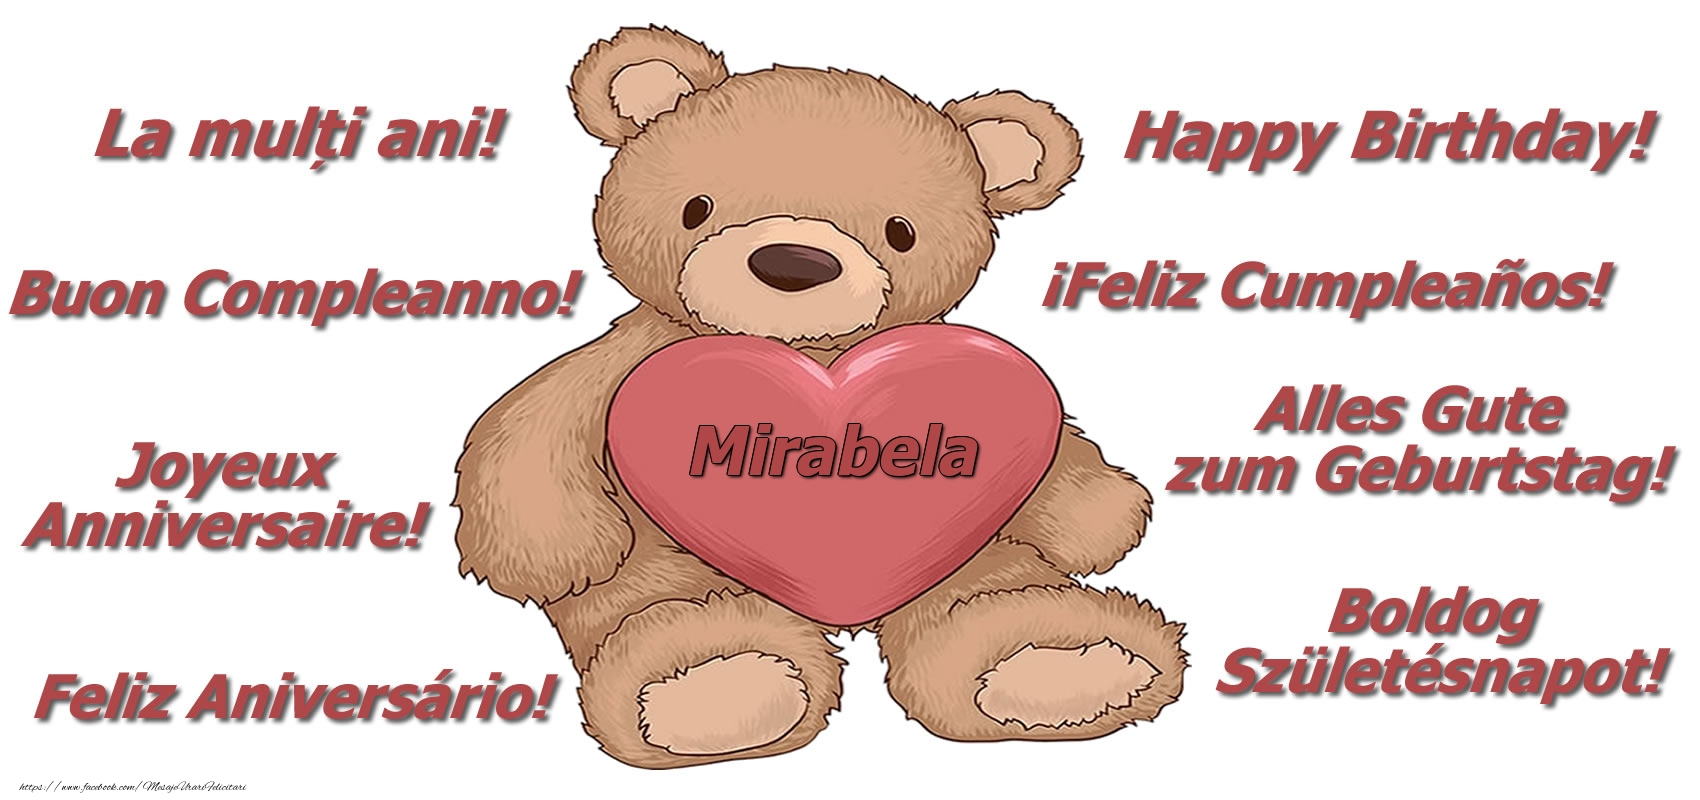 Felicitari de zi de nastere - La multi ani Mirabela! - Ursulet